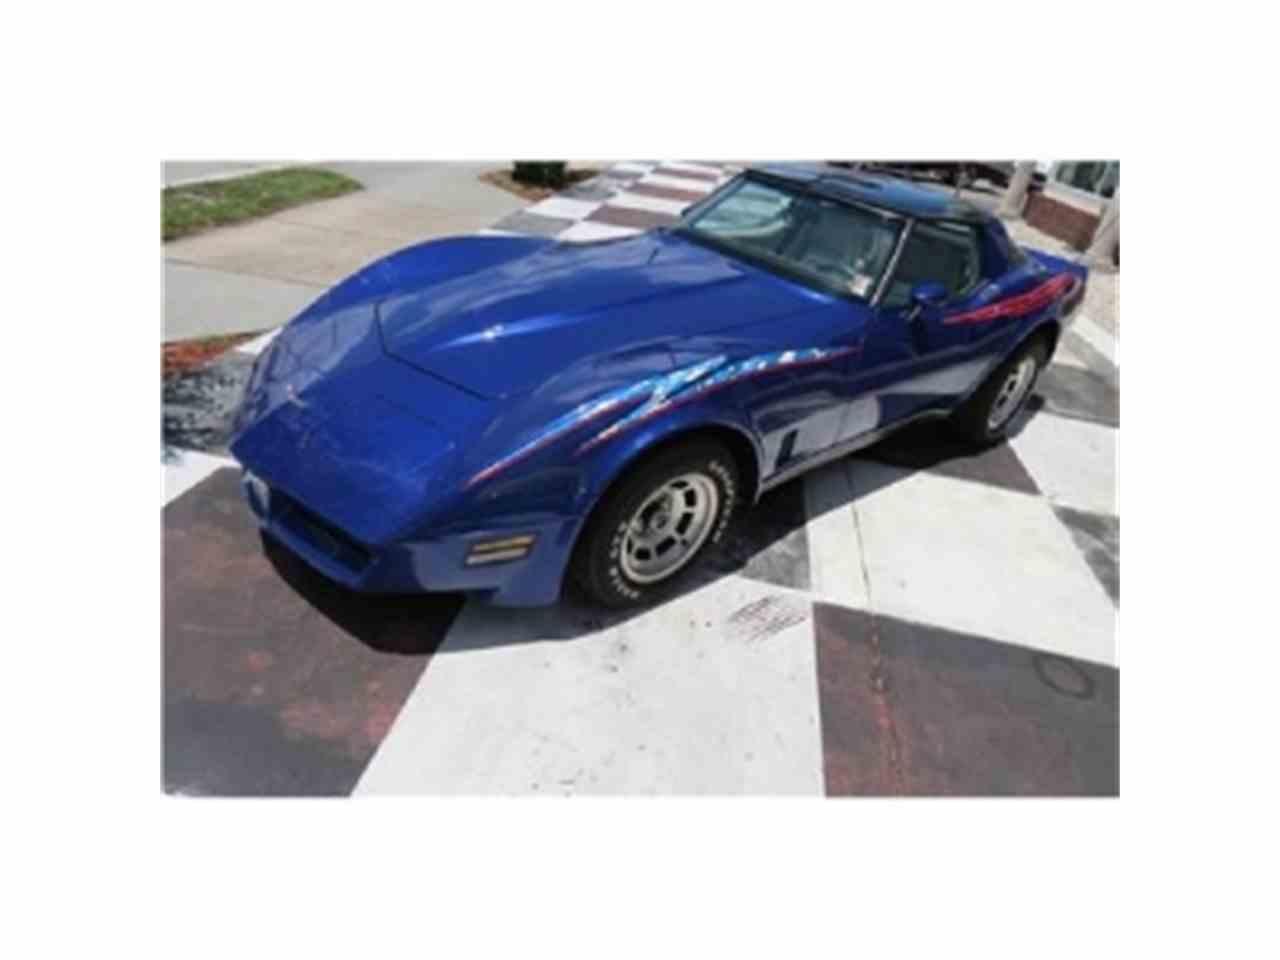 Large Picture of '80 Chevrolet Corvette located in Miami Florida - $14,500.00 - 9FZ2